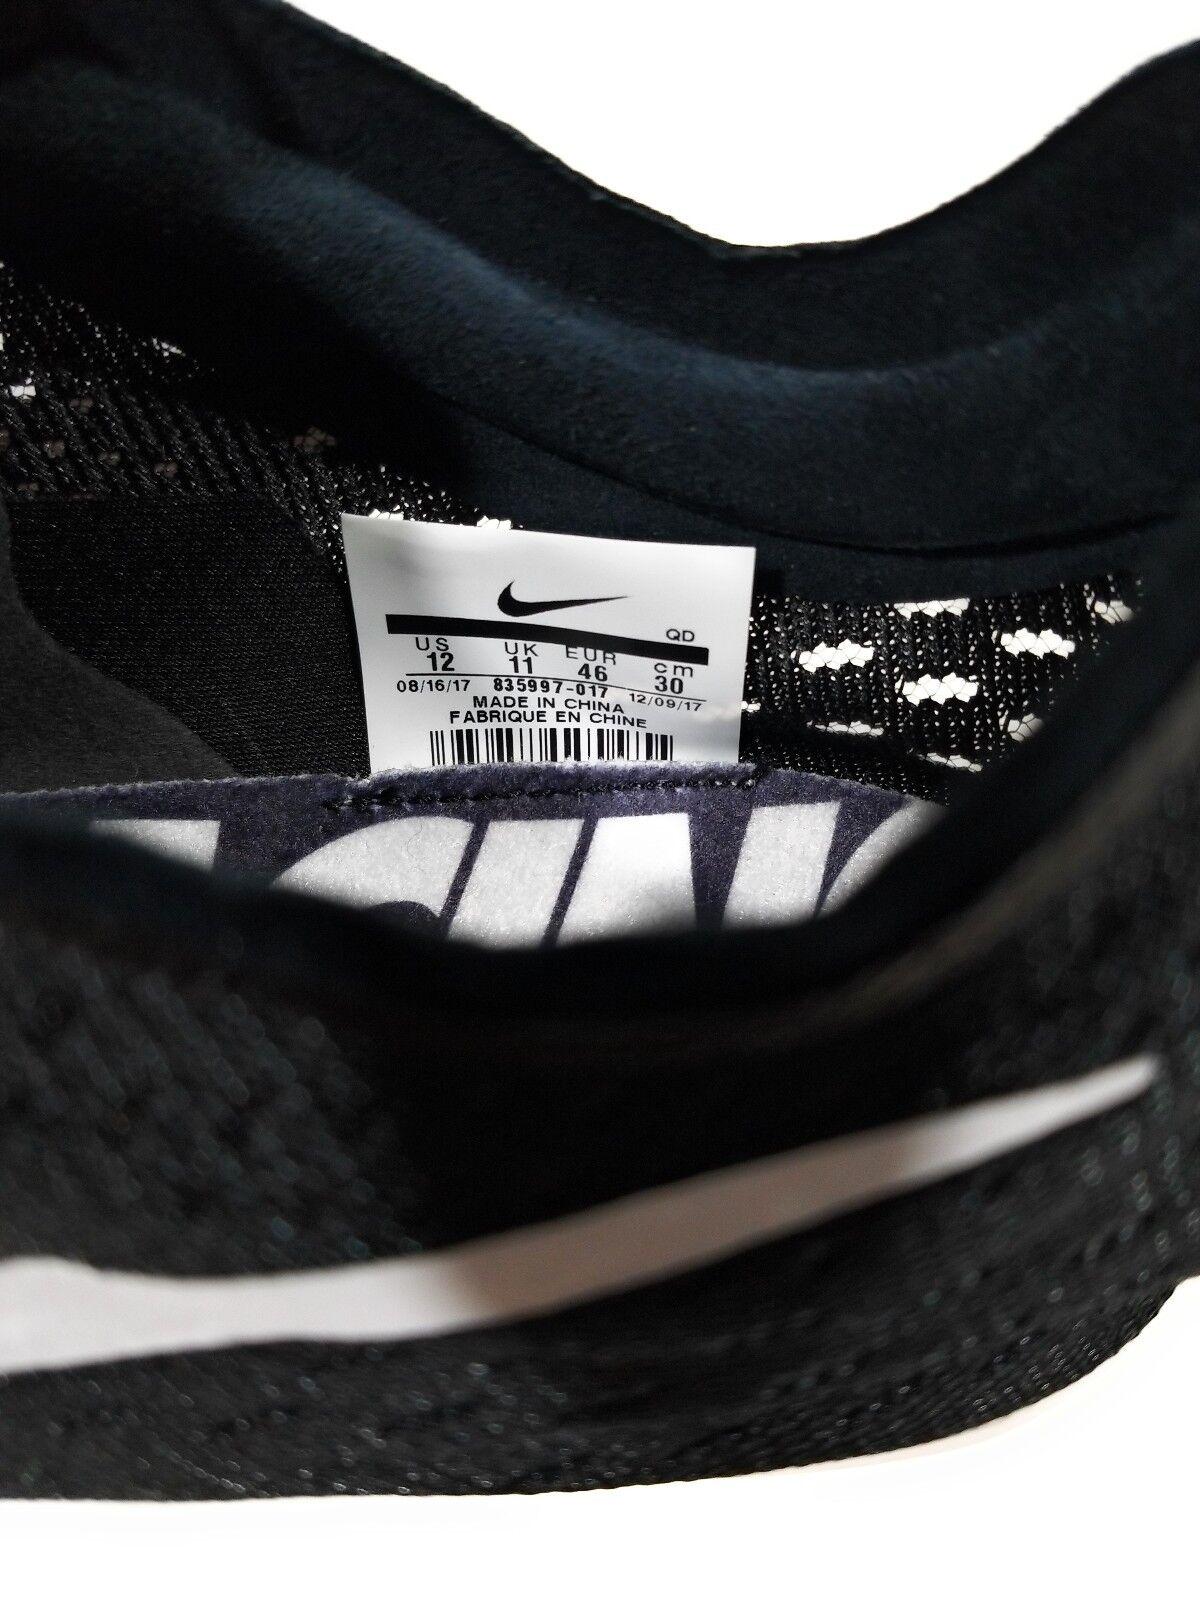 best website 50d10 ec483 ... Nike Nike Nike Zoom Victory 3 Mens Track Spikes Black White Size 12  0a109a